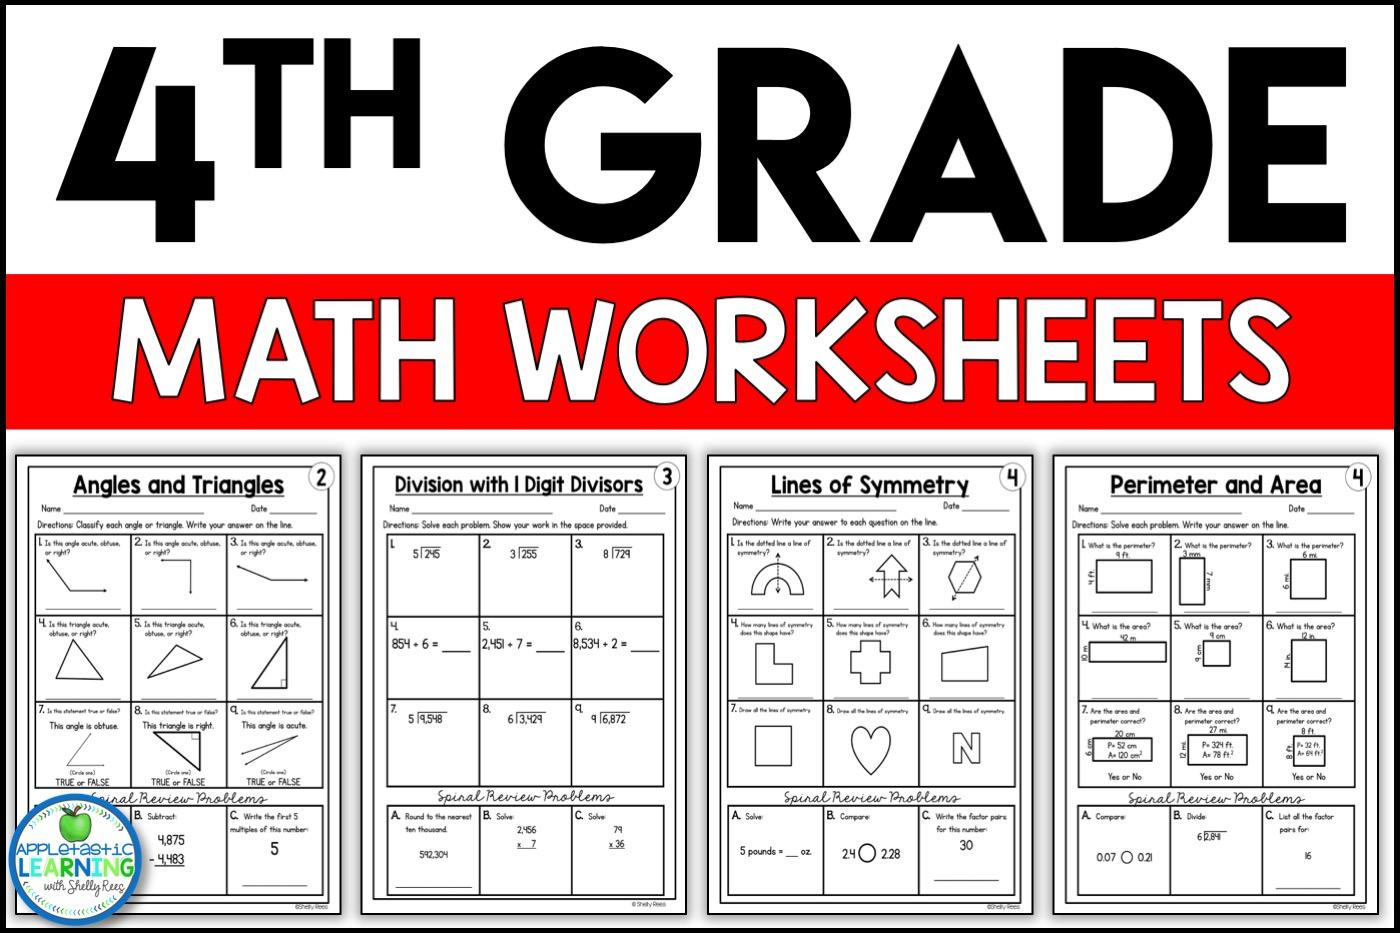 4th Grade Math Worksheets Free And Printable